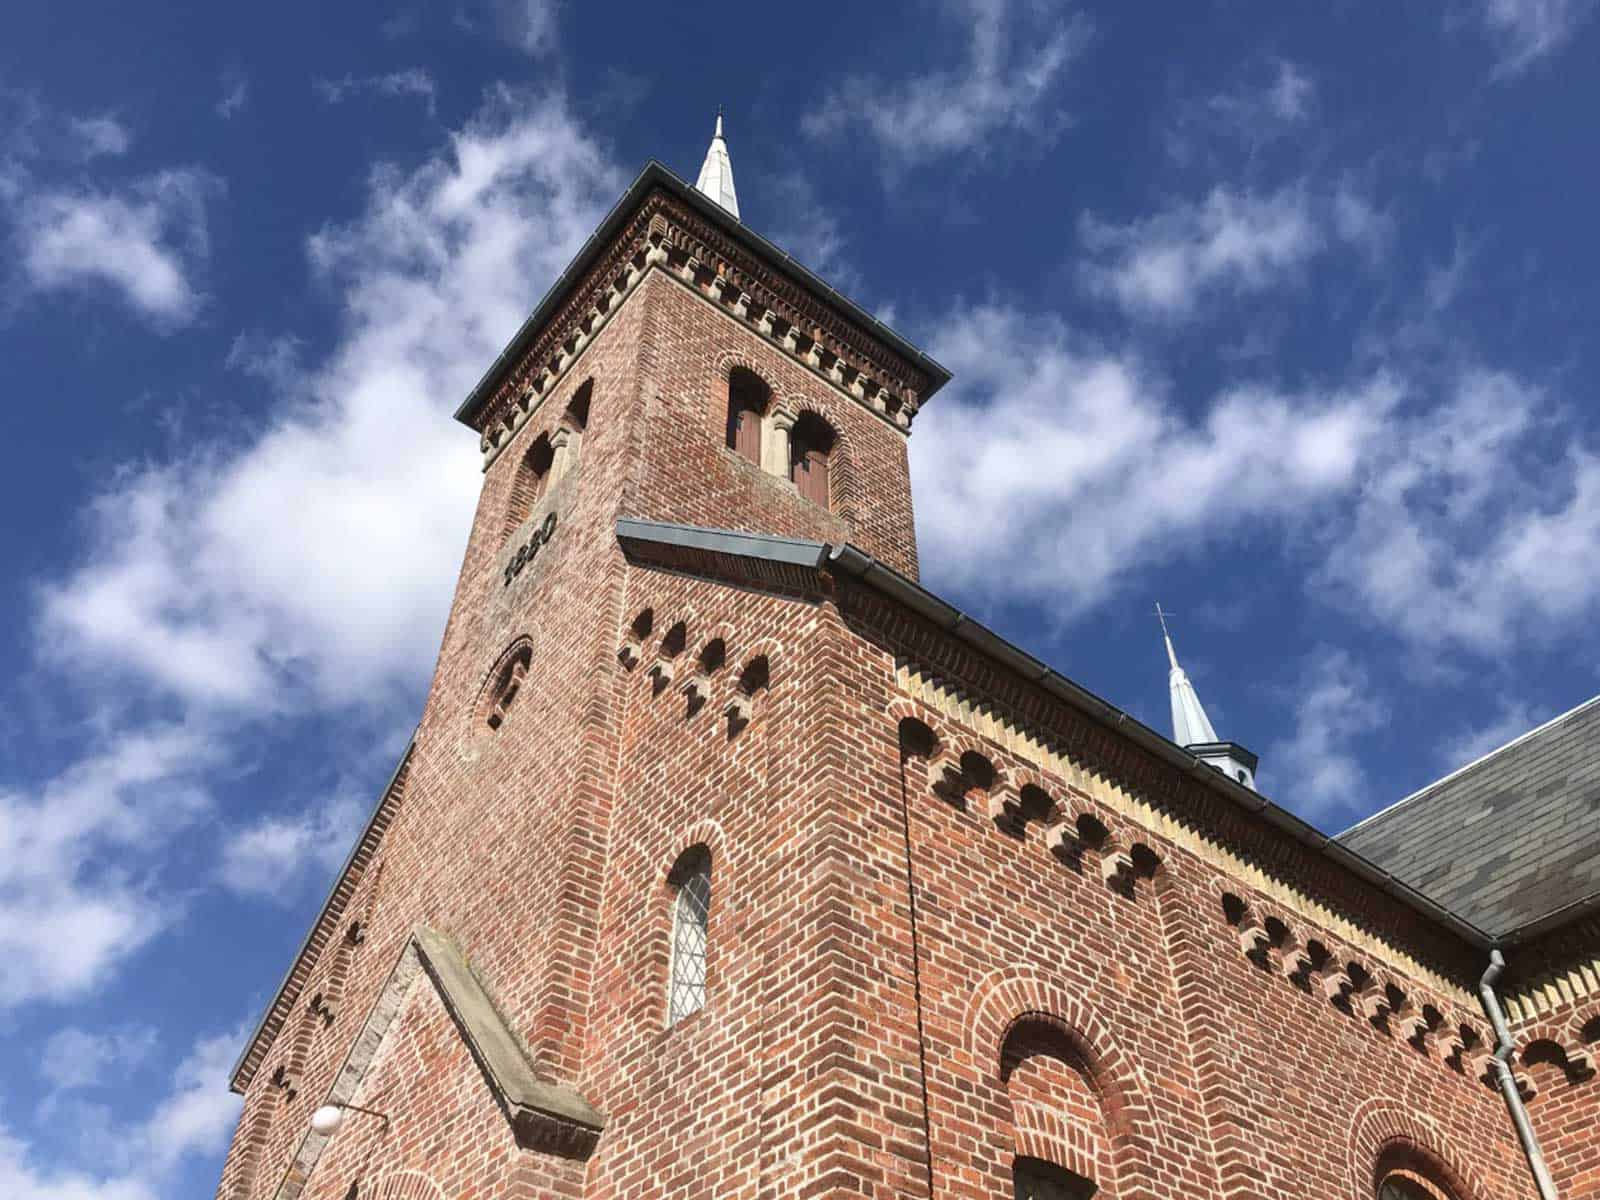 Ristinge Kirke kirketårn